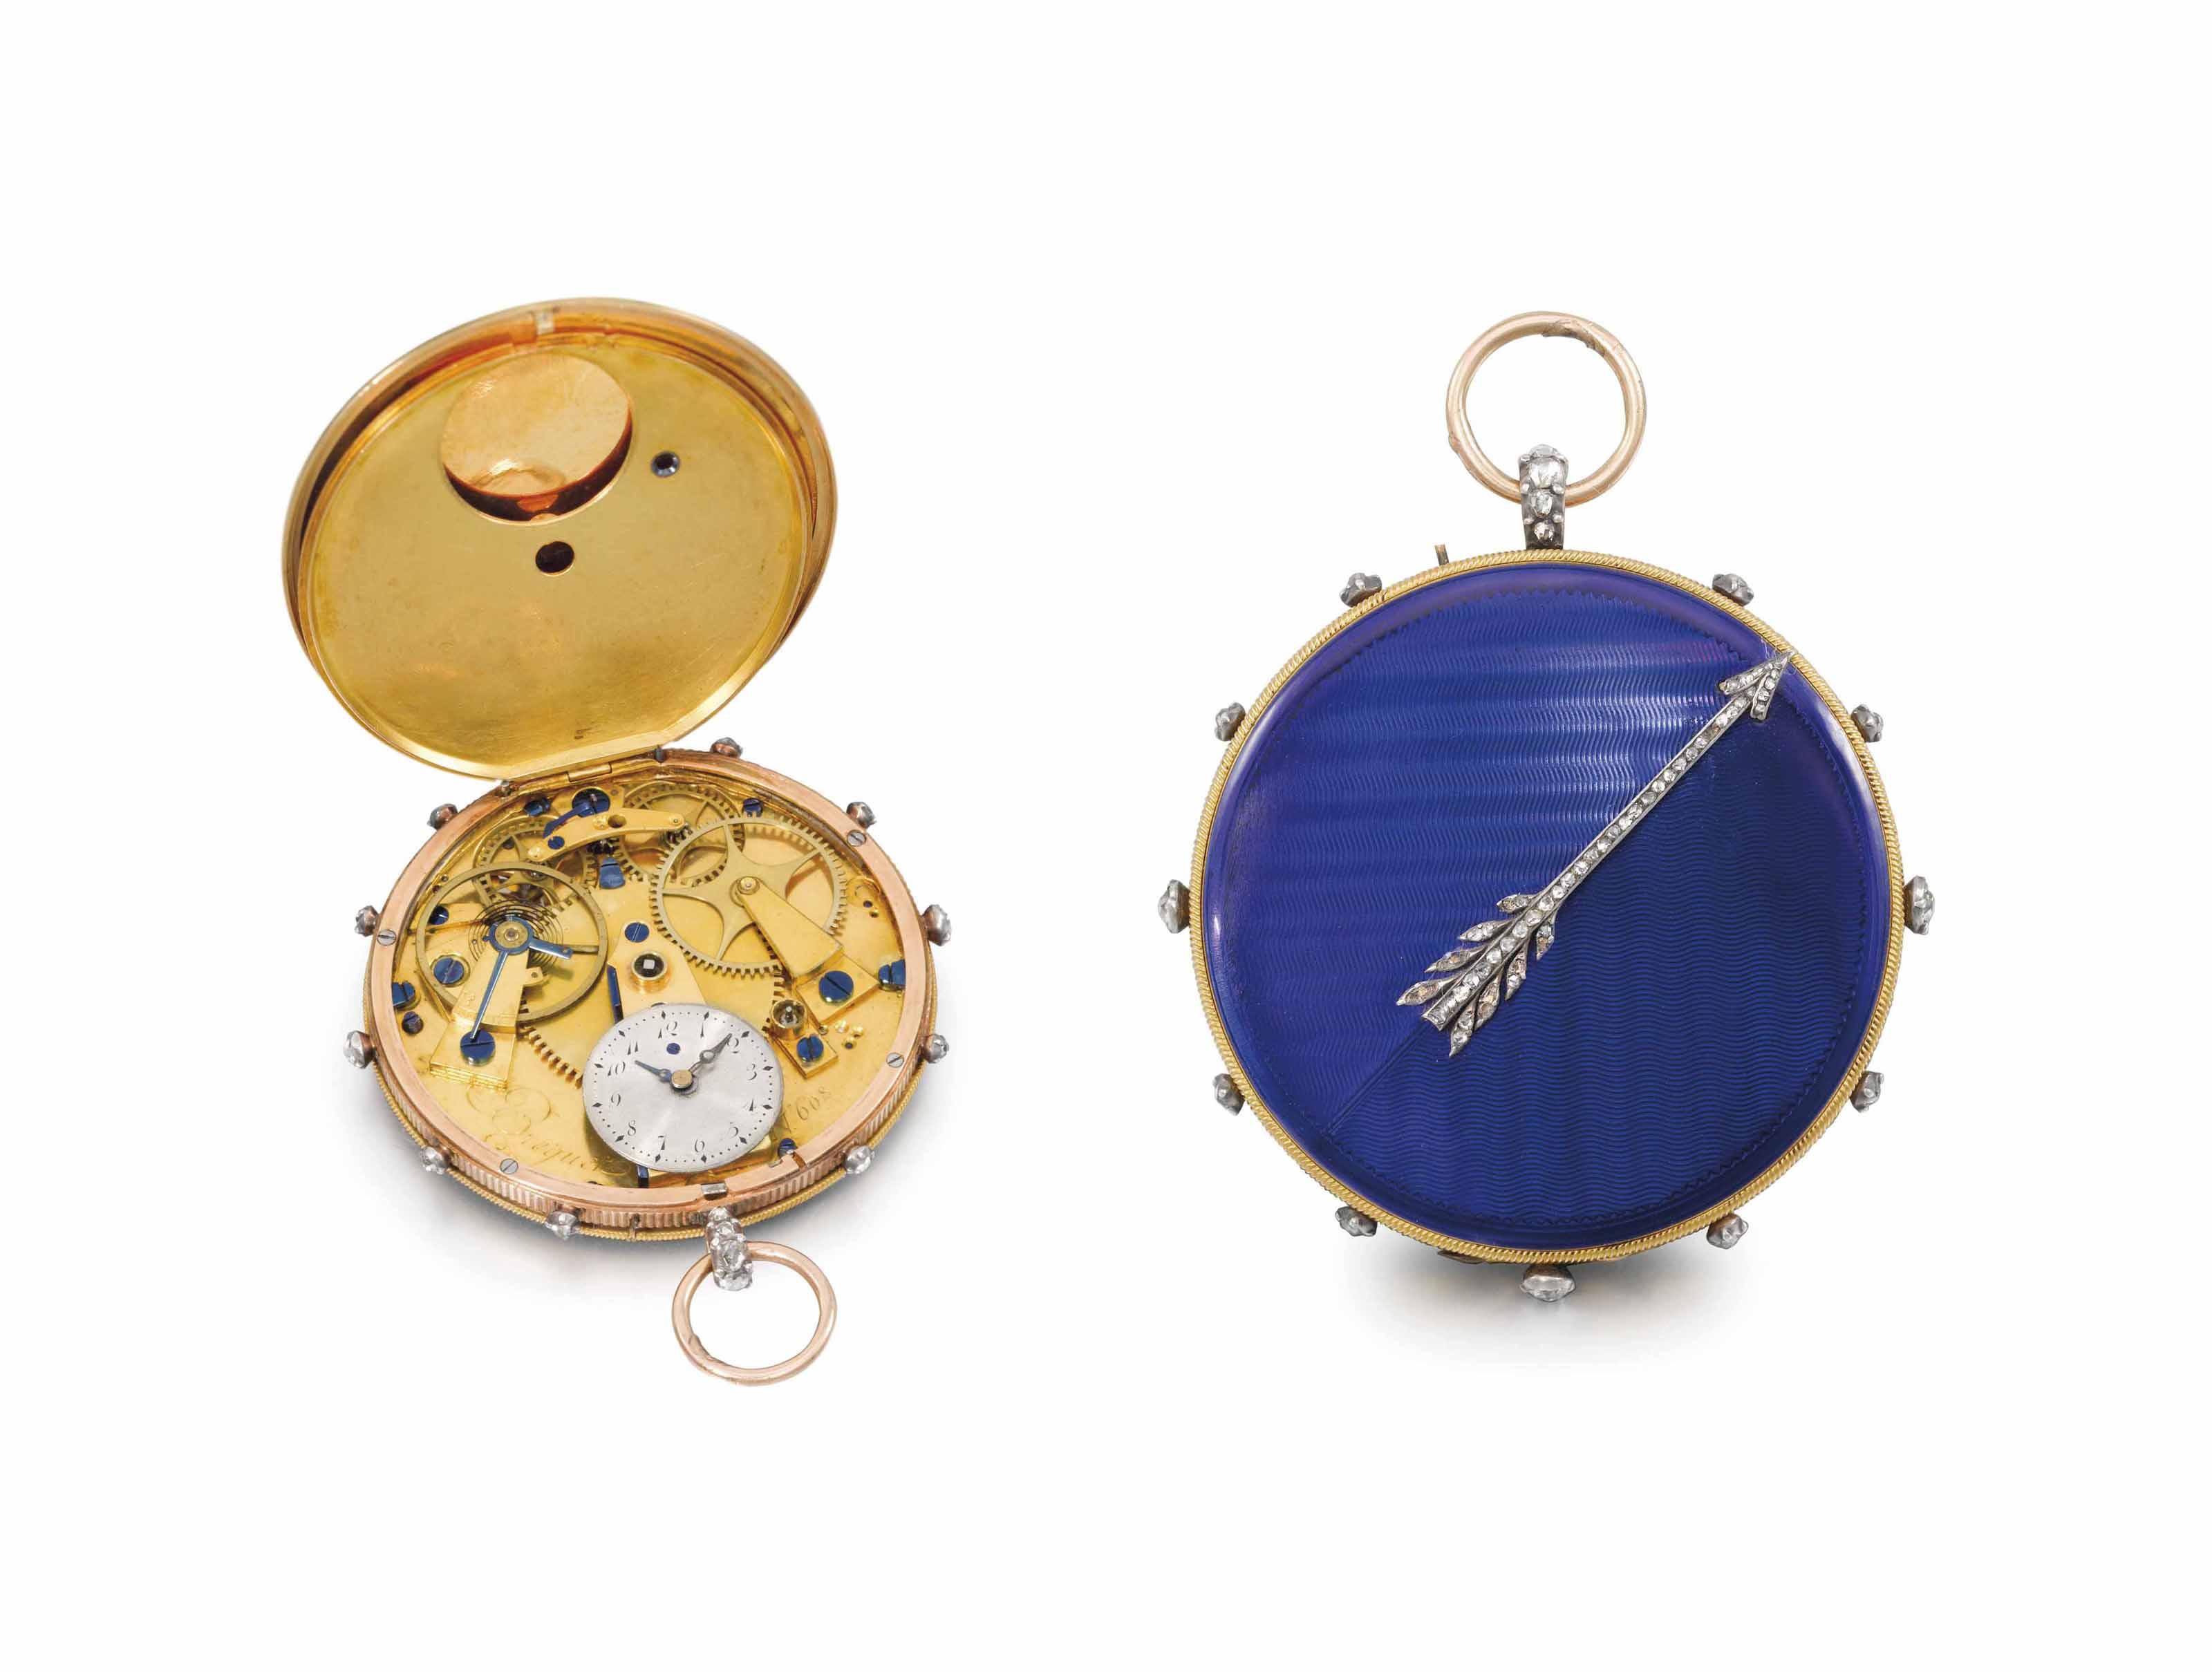 Breguet. A very fine, rare and attractive 18K pink gold, enamel and diamond-set hunter case 'médaillon montre à tact' cylinder watch